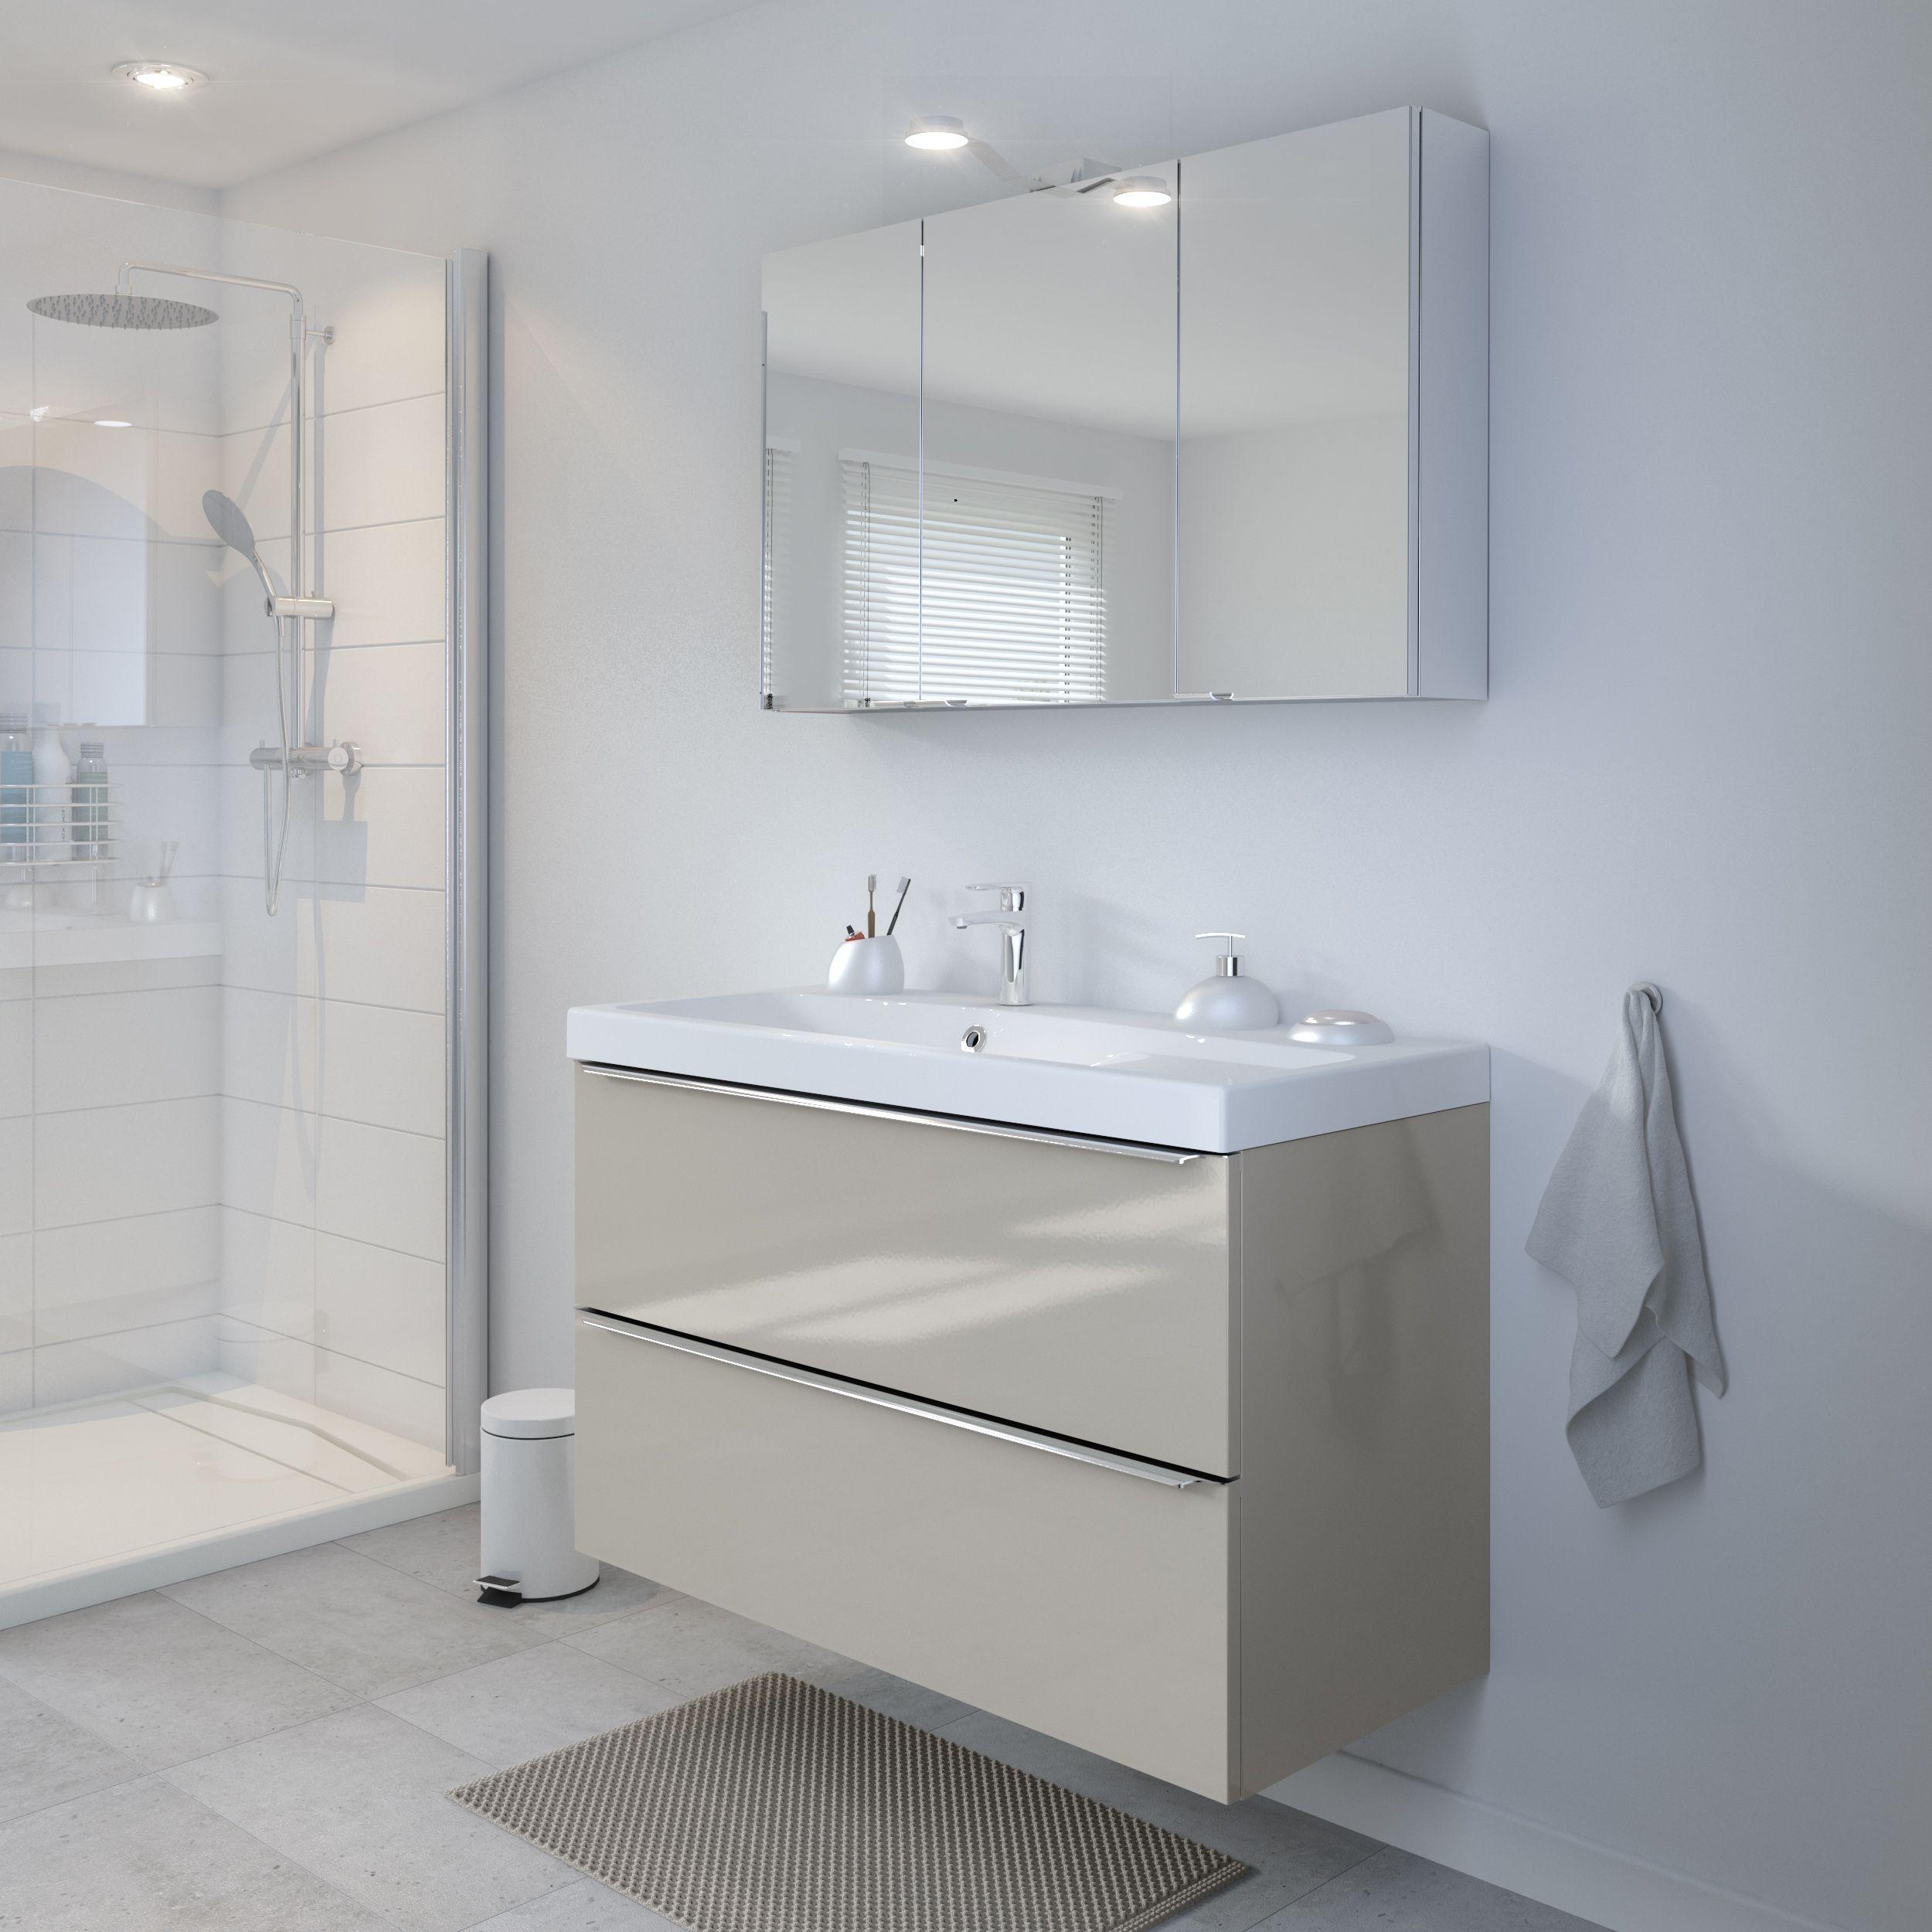 29+ Imandra bathroom furniture model